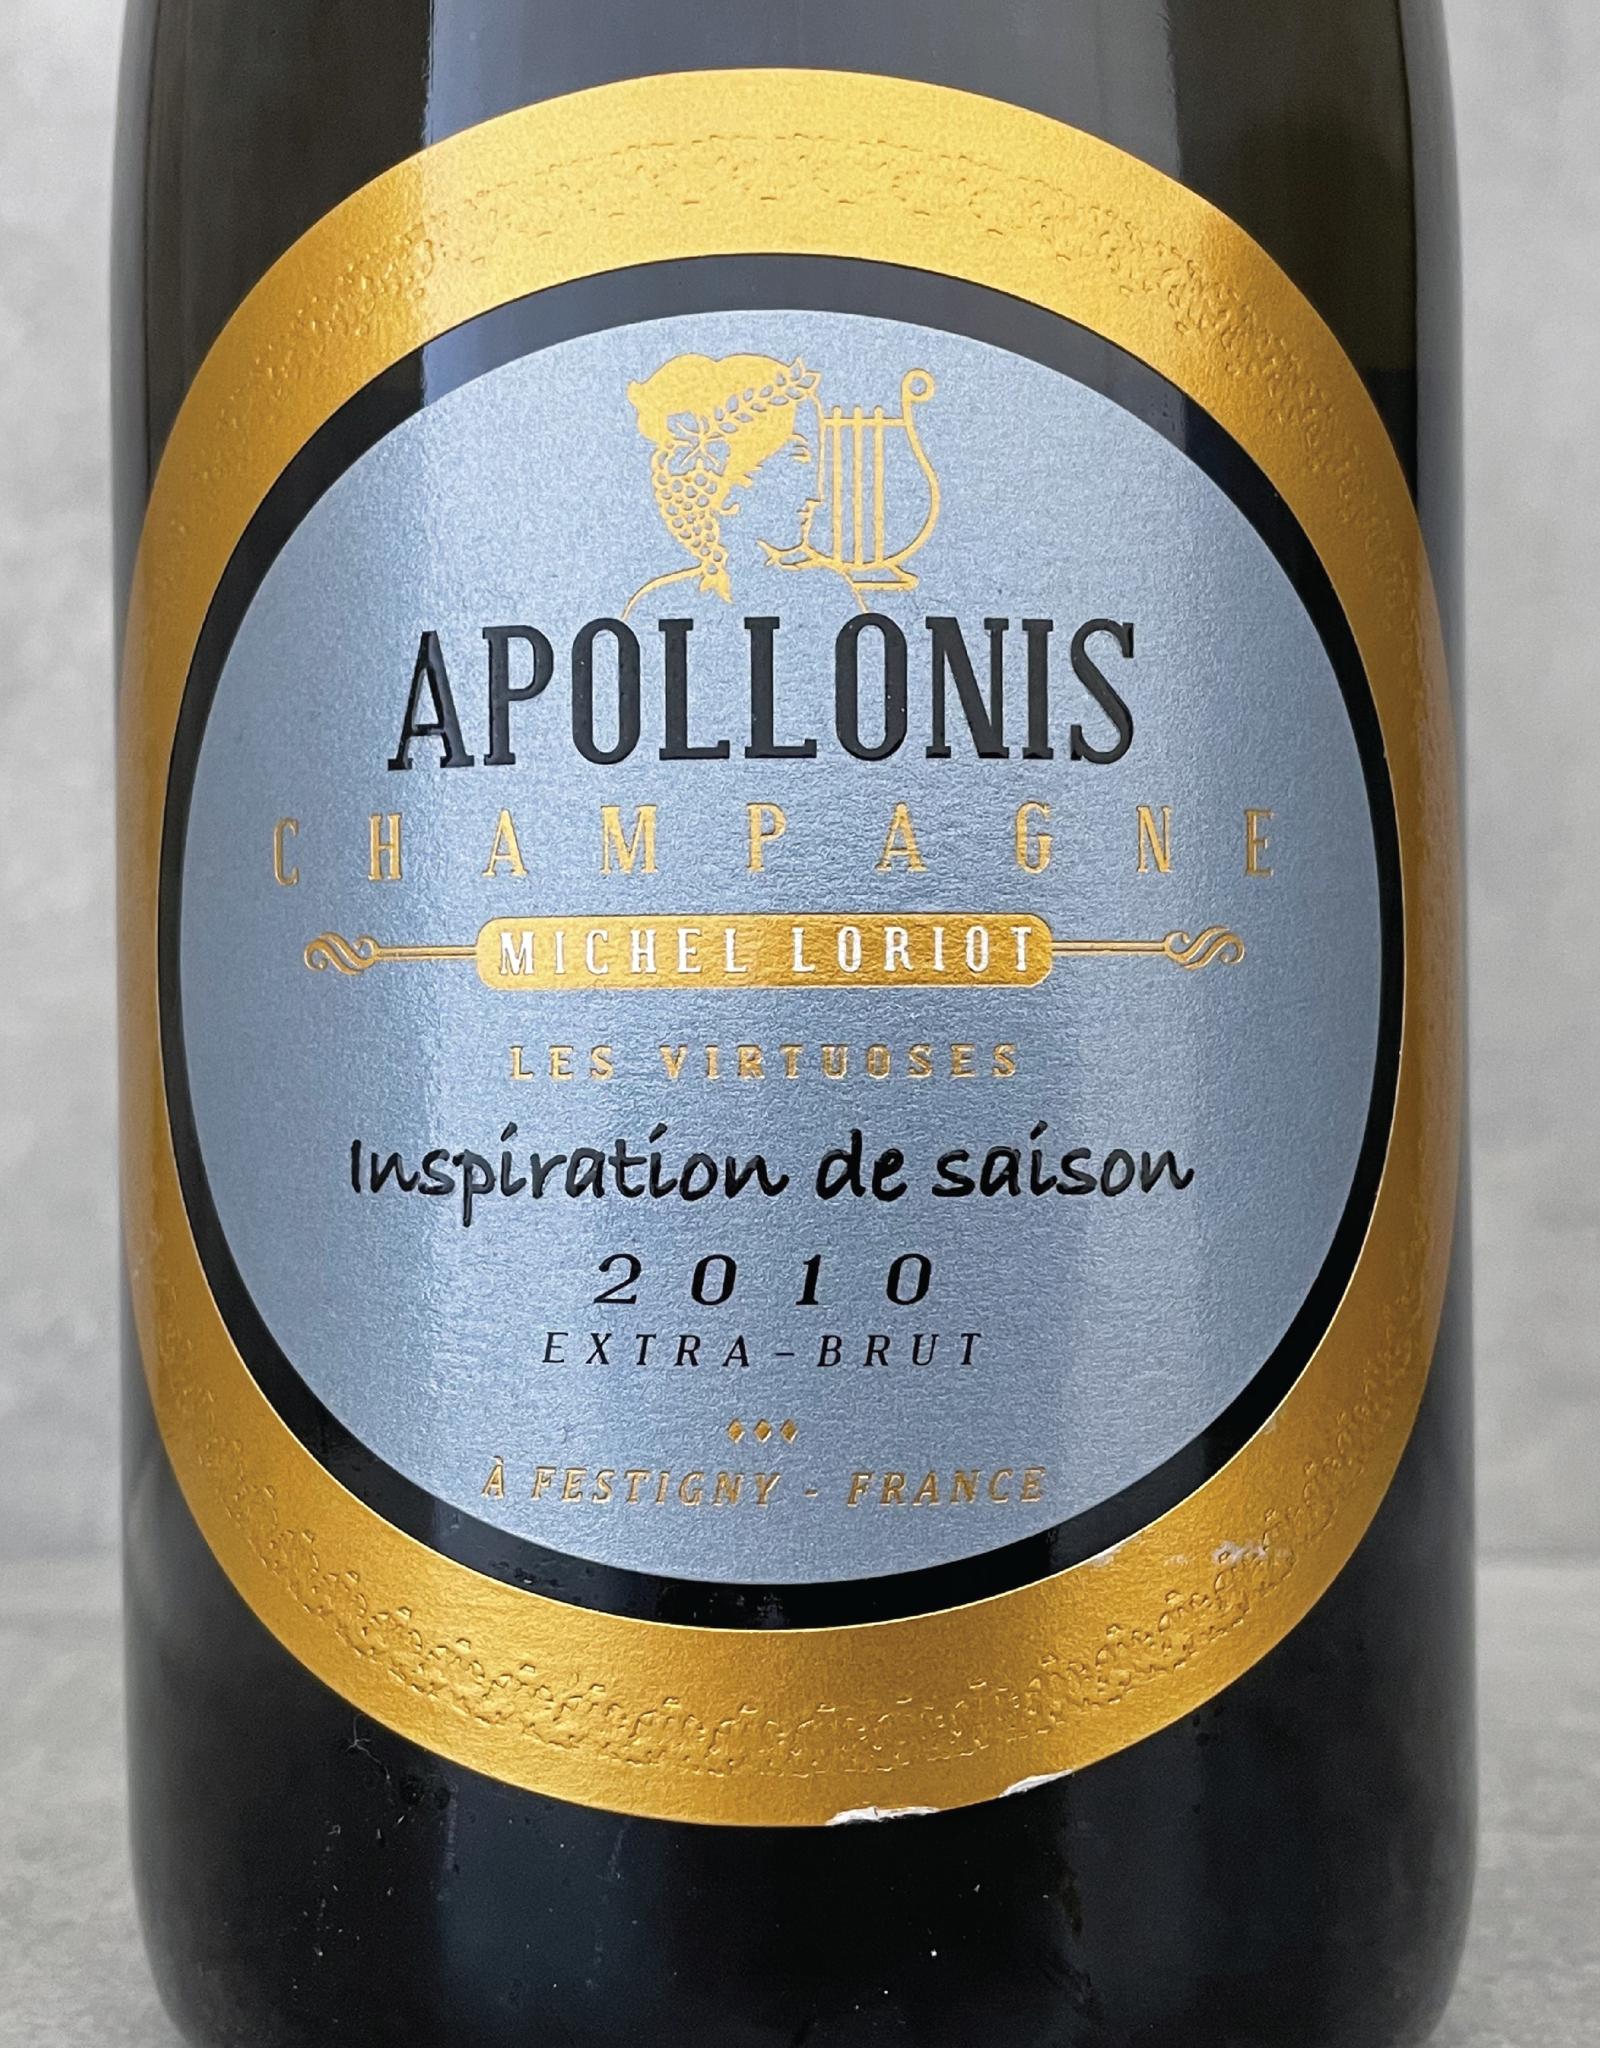 Apollonis Inspiration de Saison Extra Brut 2012